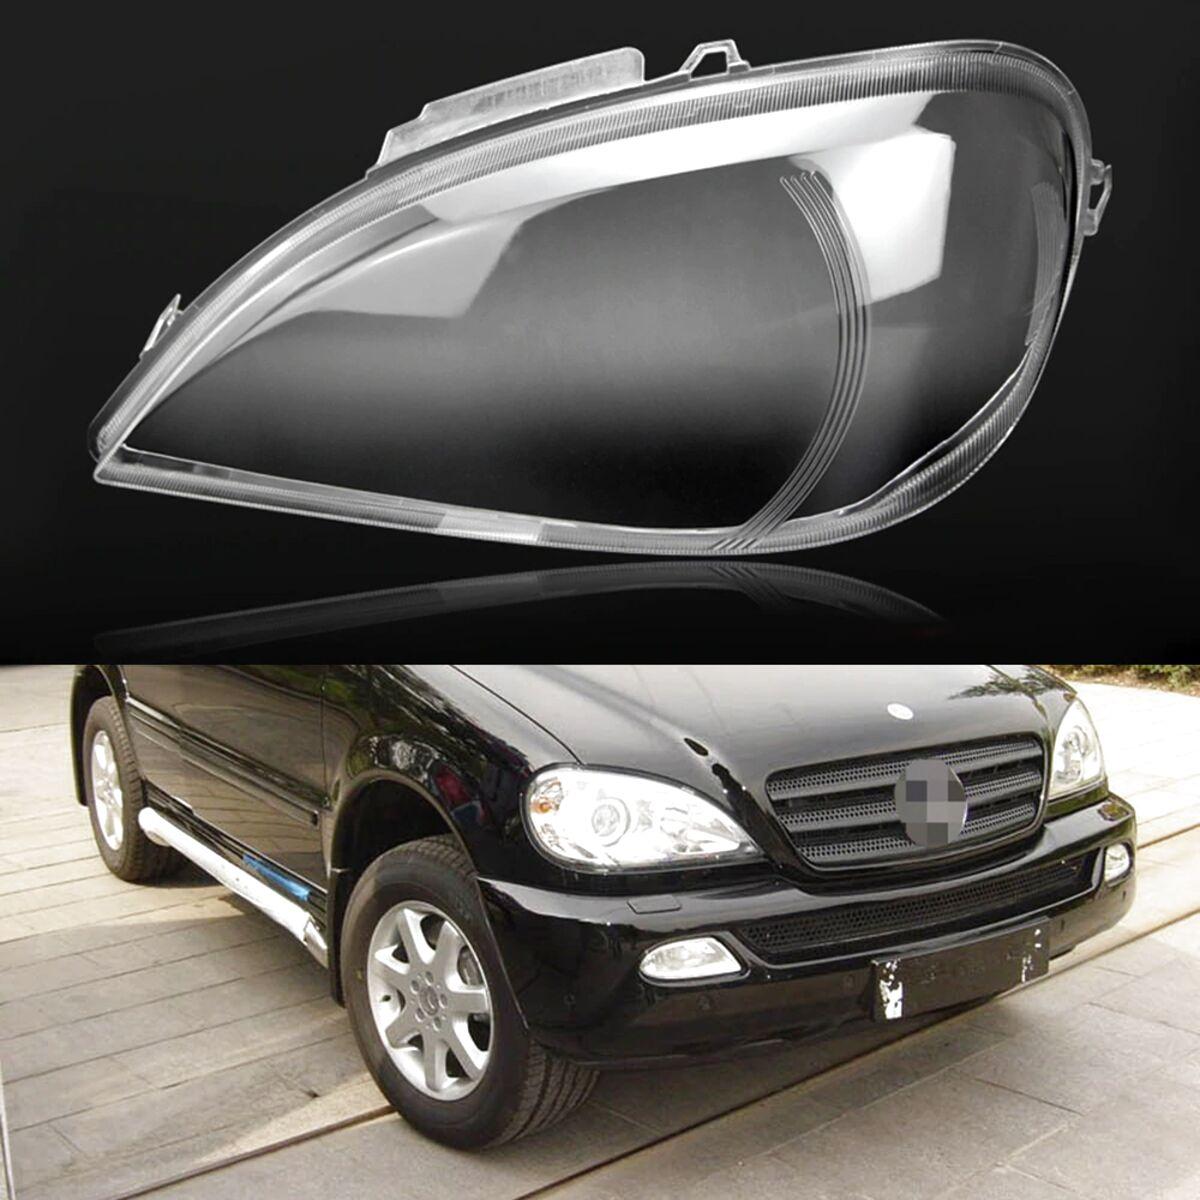 w163 headlight for sale